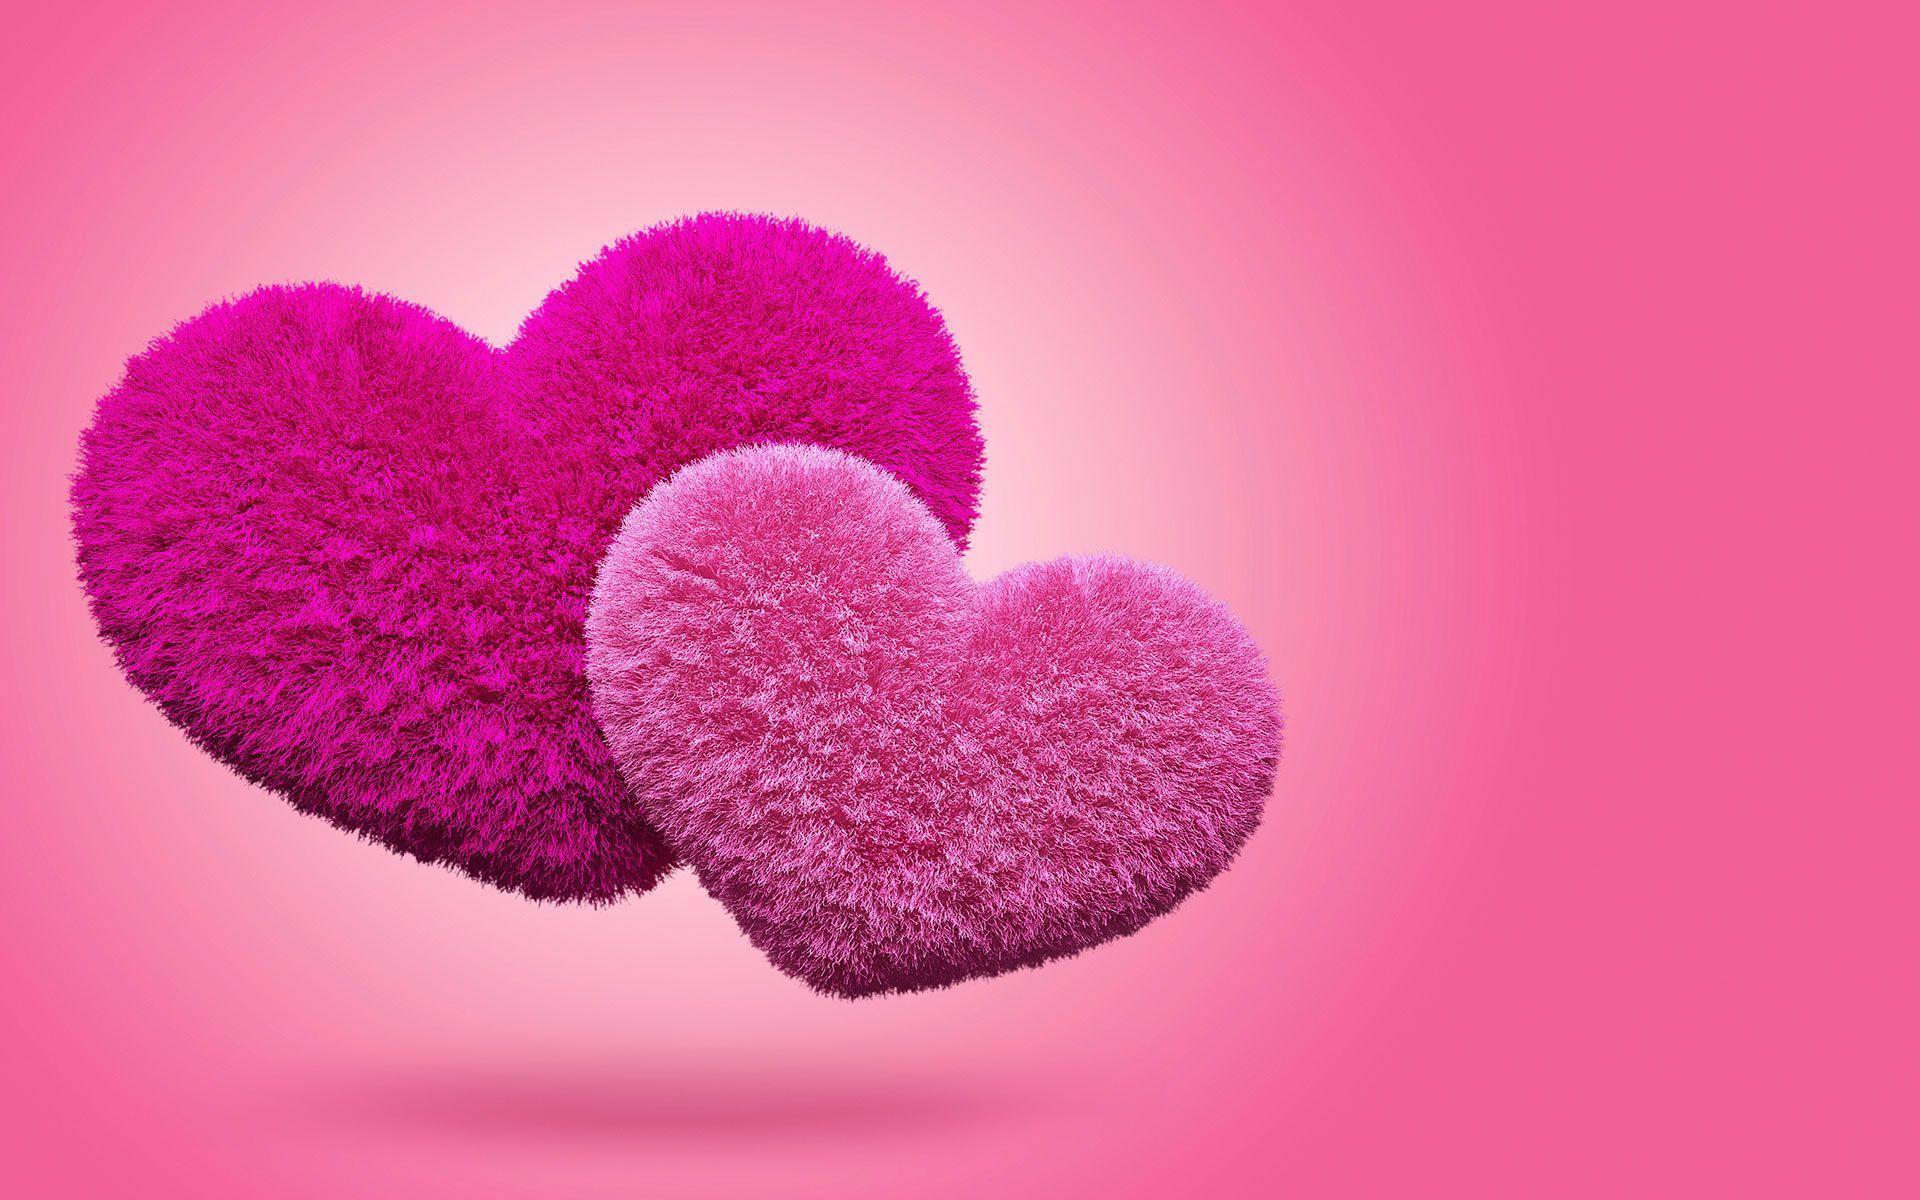 35 best free heart wallpapers - wallpaperaccess